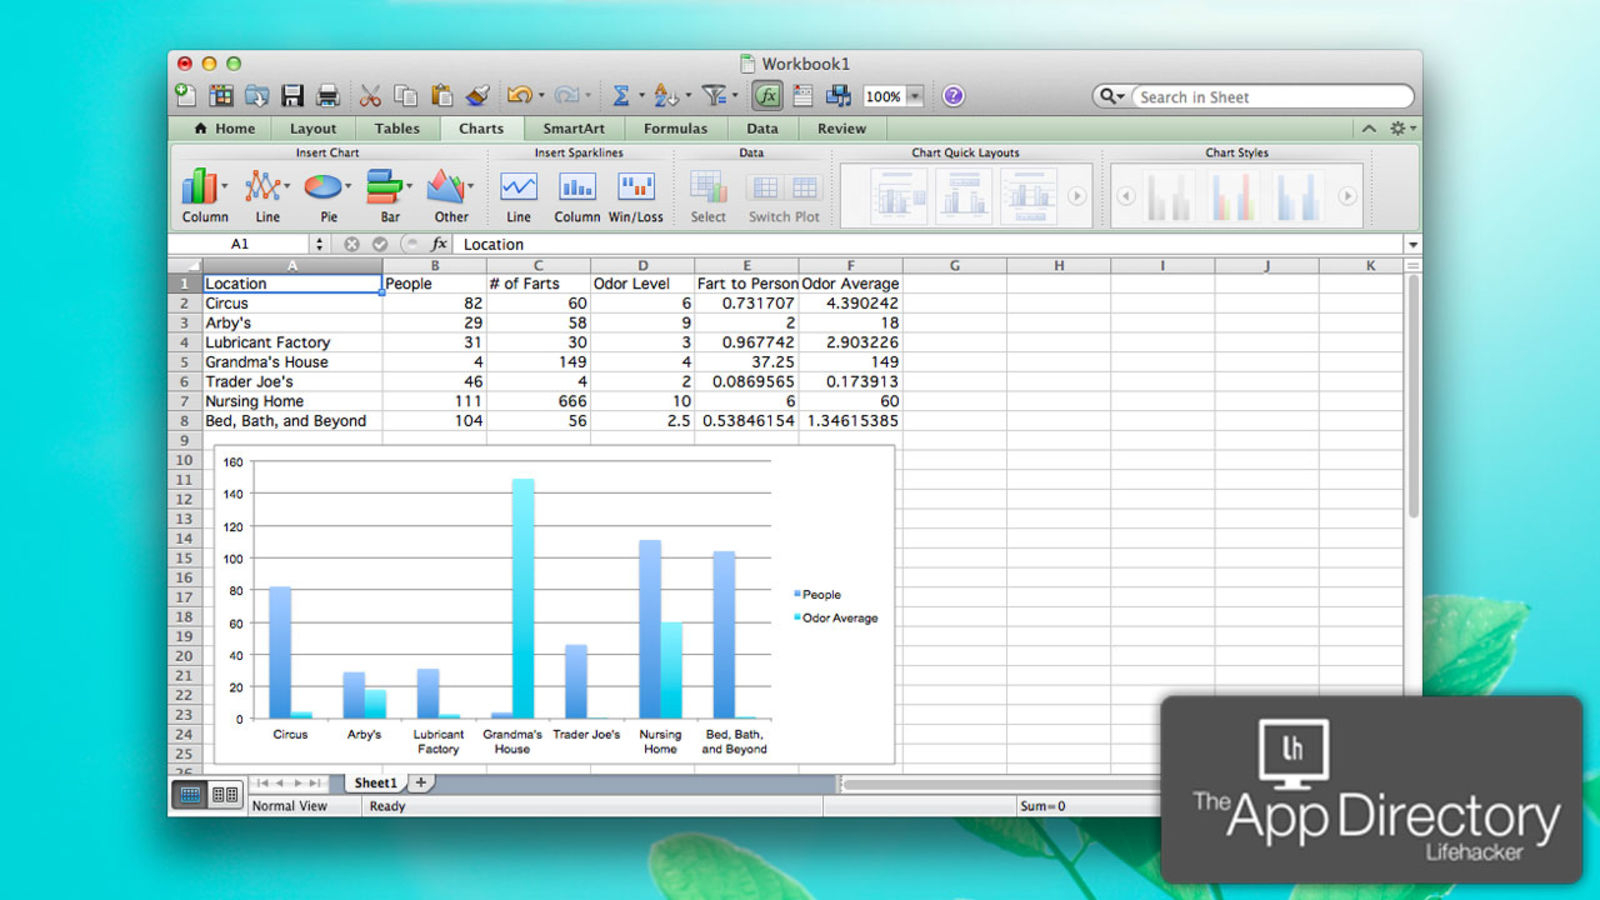 Spreadsheet App For Mac Regarding The Best Spreadsheet App For Mac